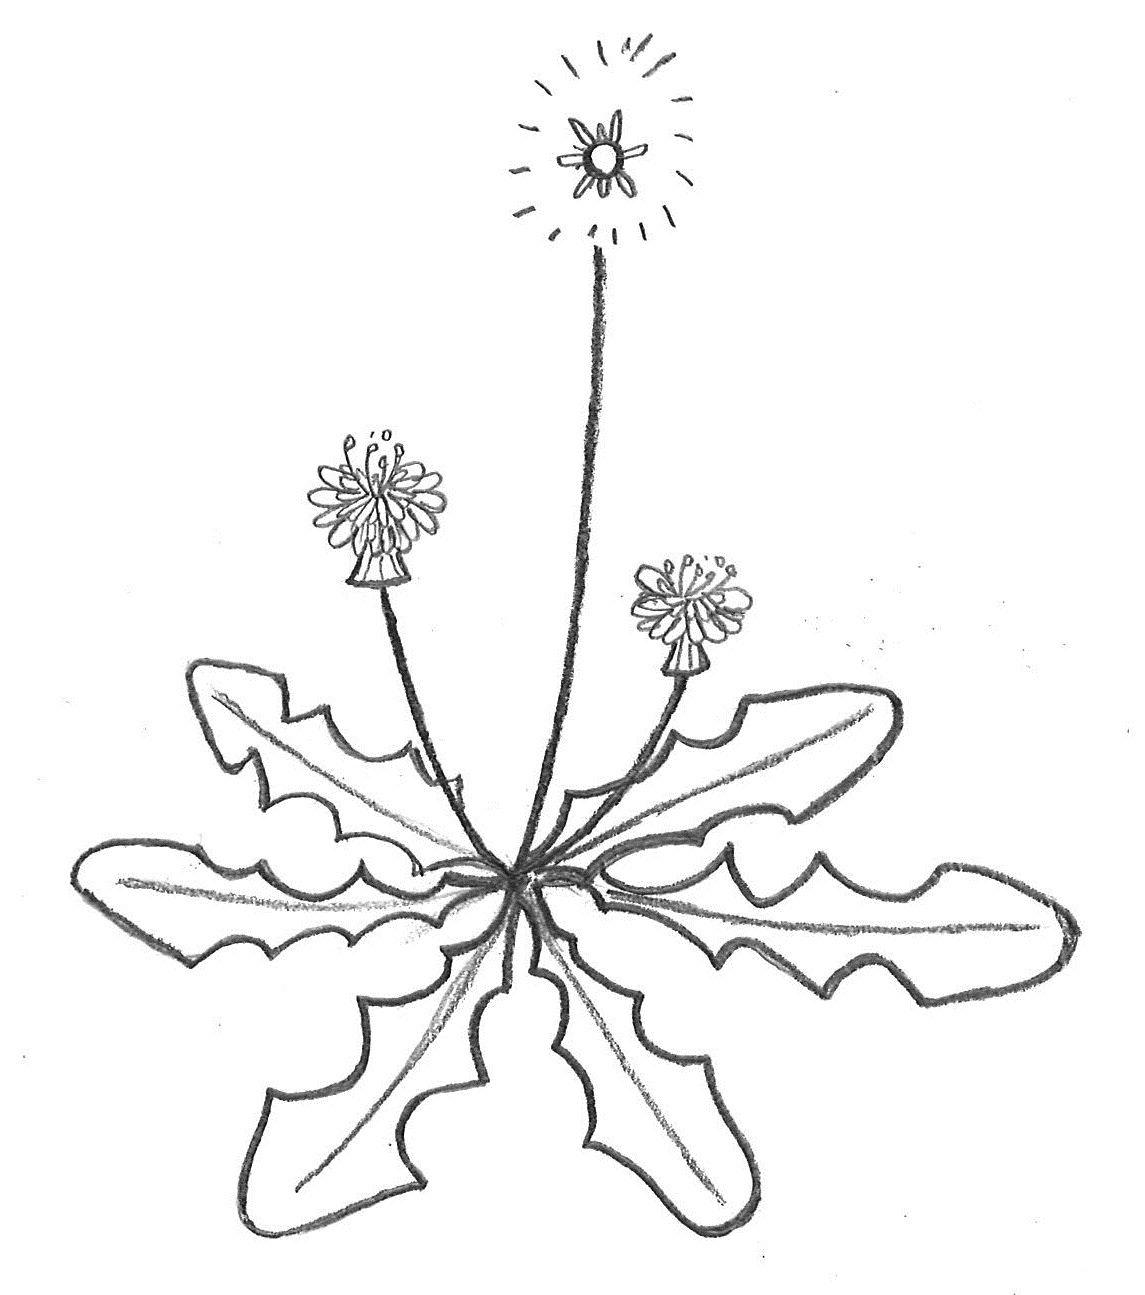 hight resolution of 1145x1295 weeds poll awkward botany